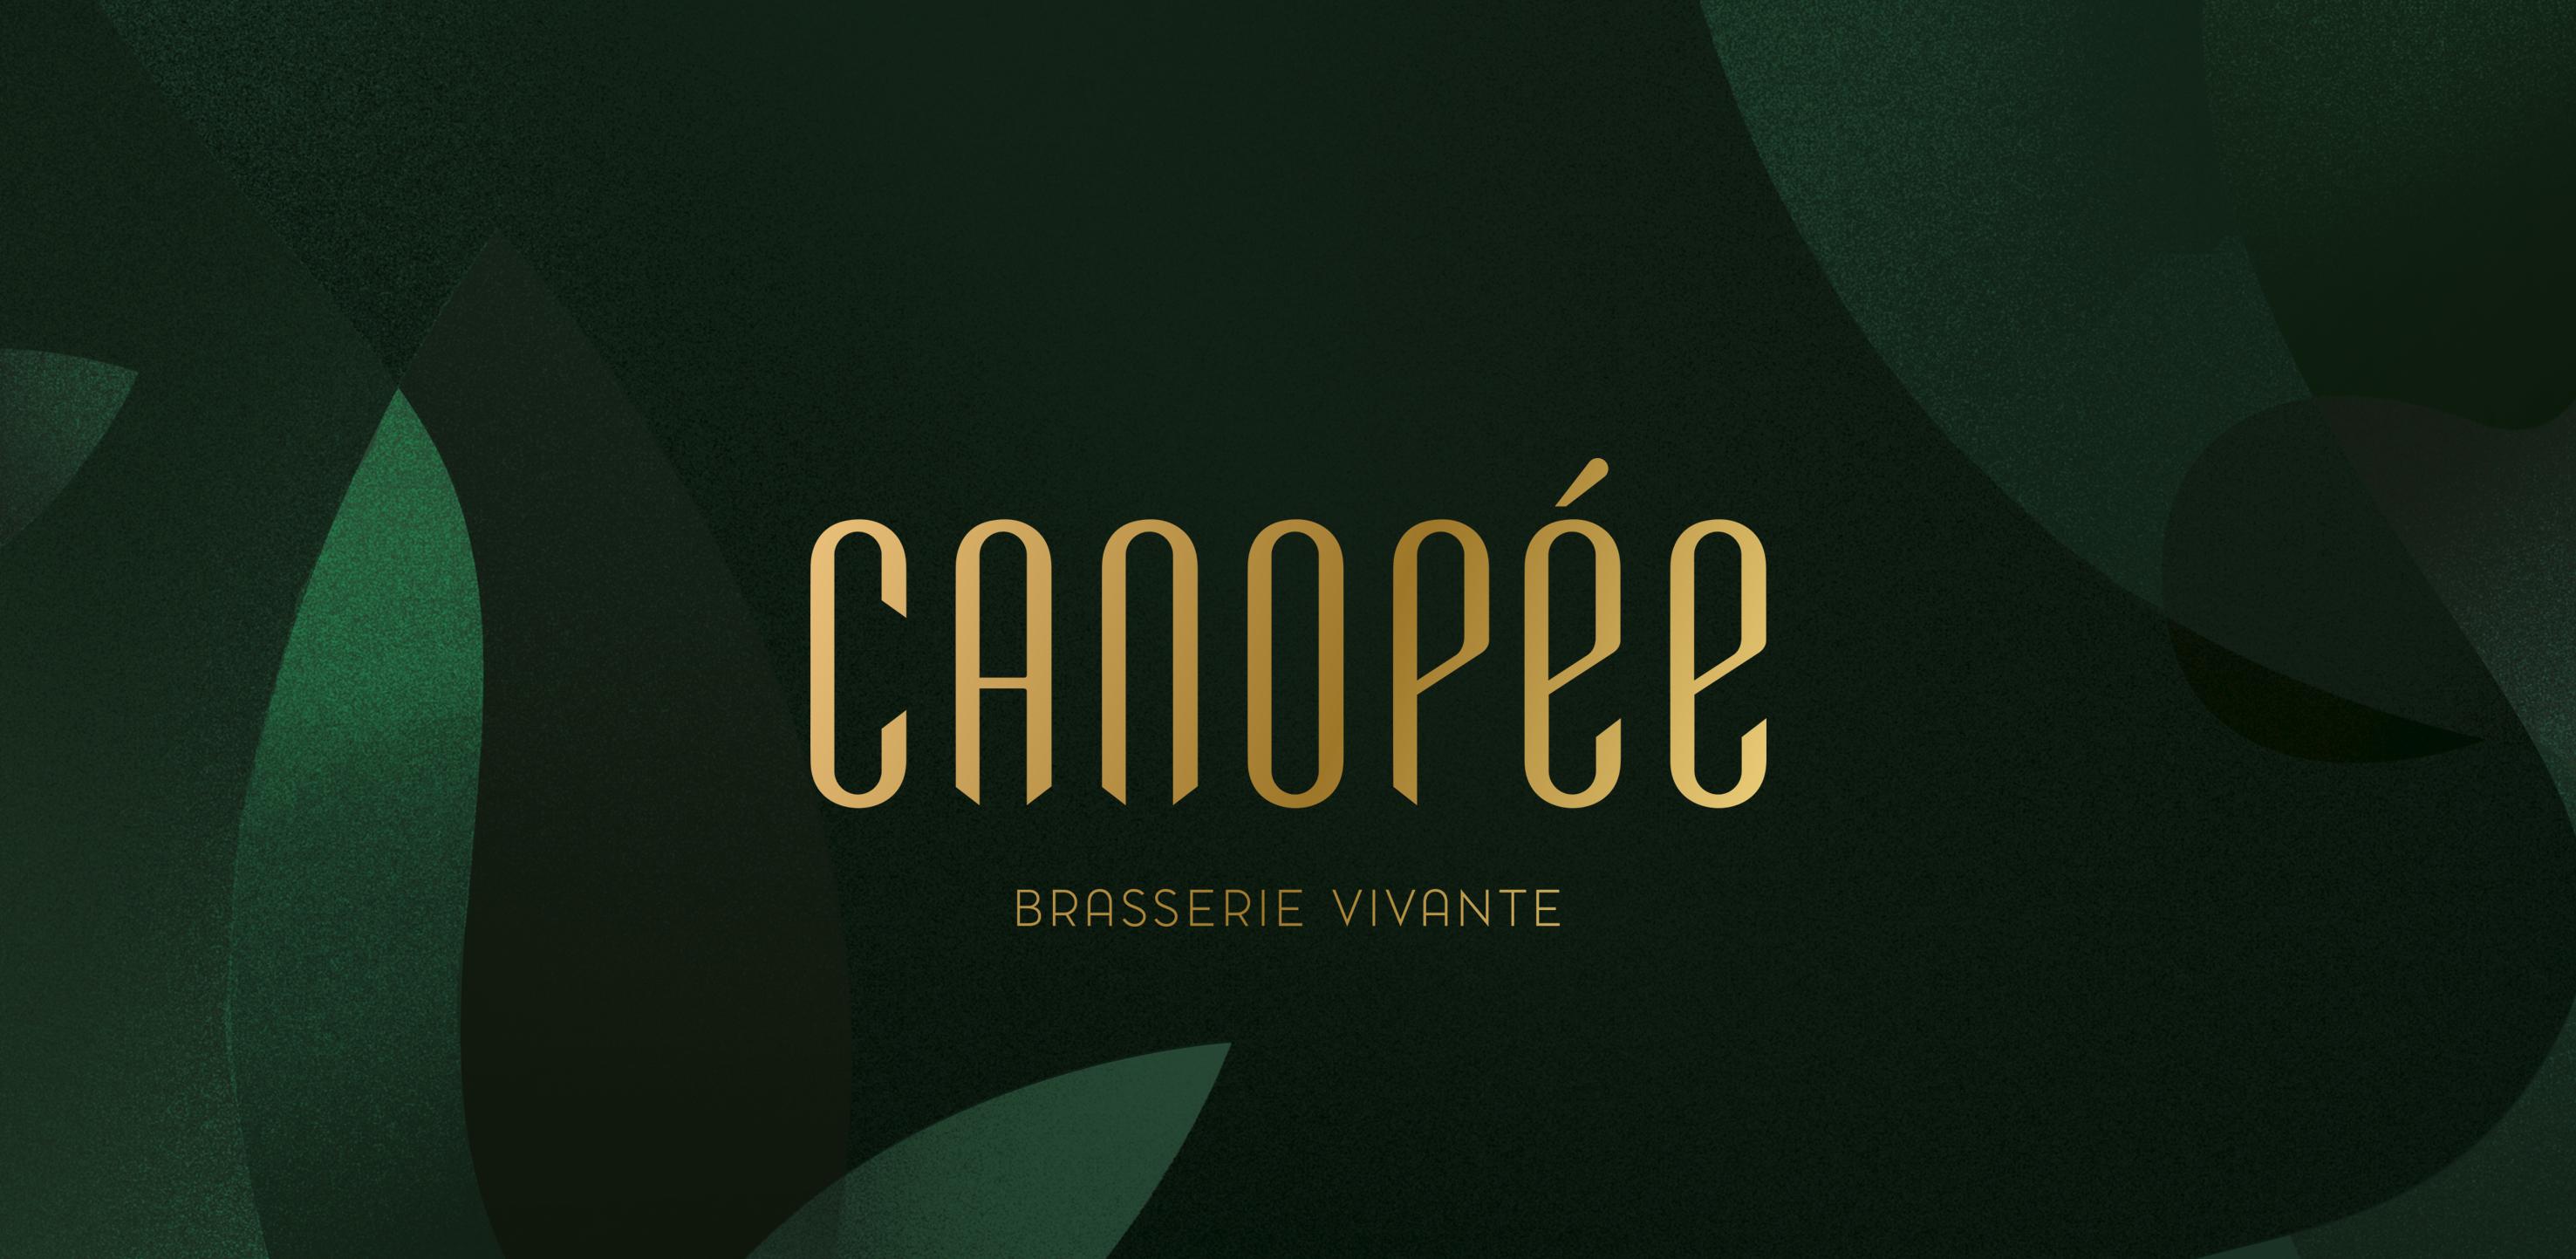 Restaurant-Luxe-Design-Graphique-Nantes-Canopee-4